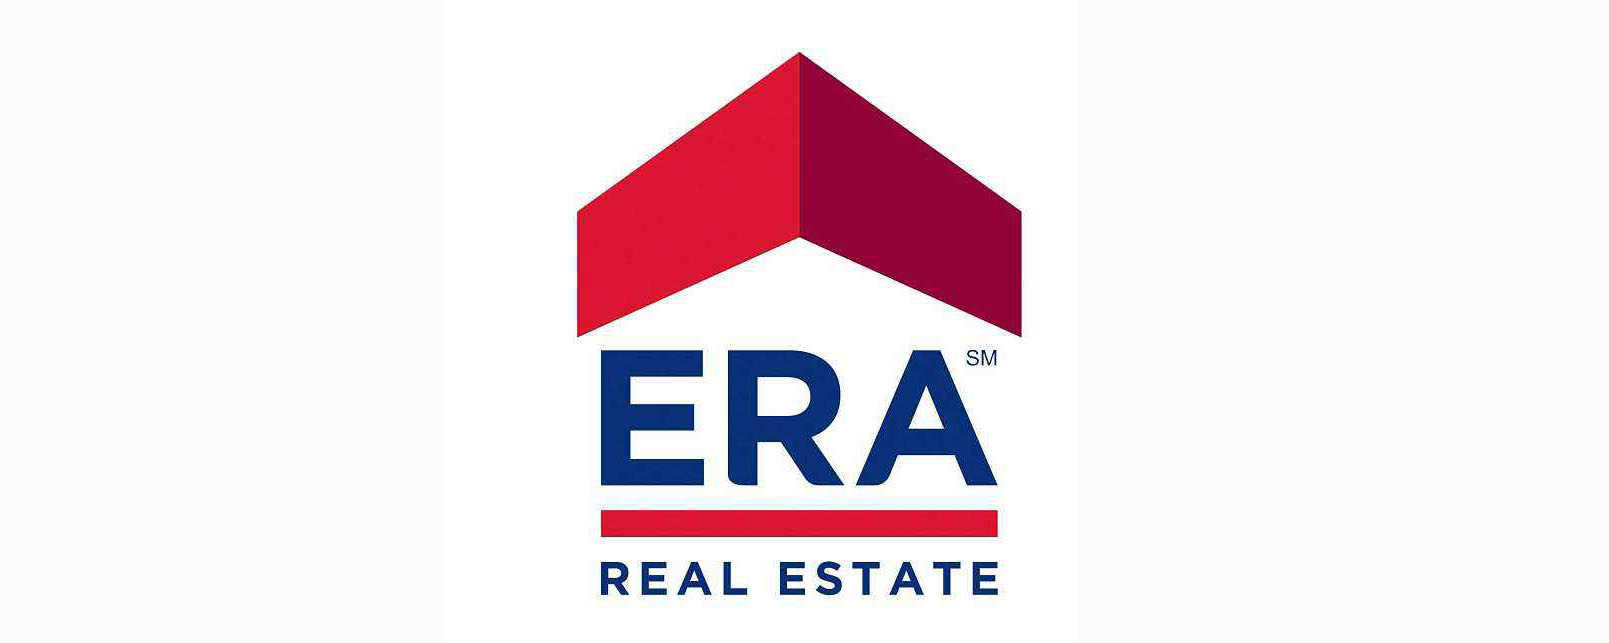 ERA Realty Network Singapore